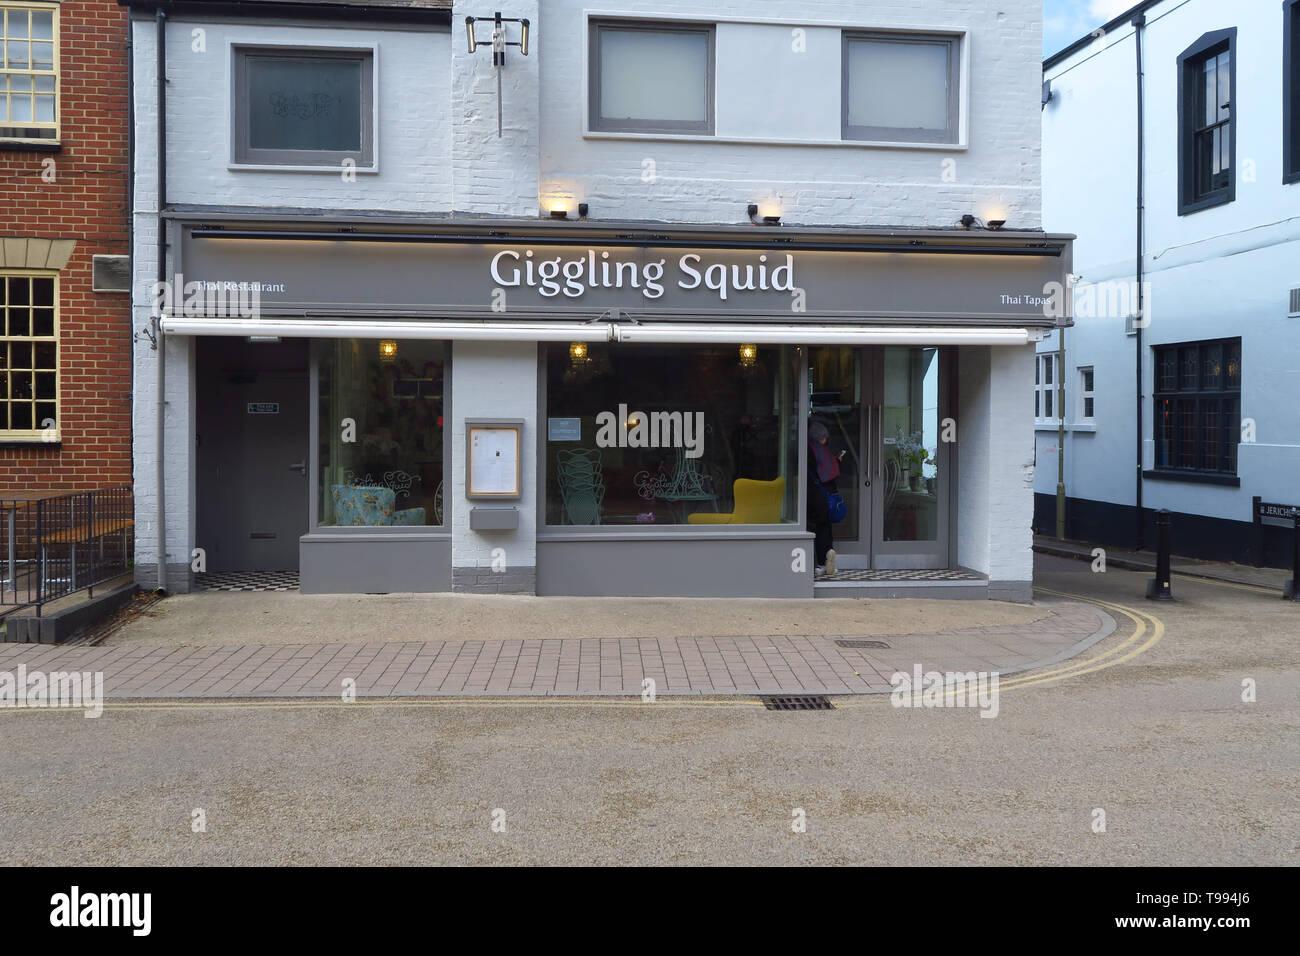 Giggling Squid Thai Restaurant, Walton Street, Jericho, Oxford Stock Photo